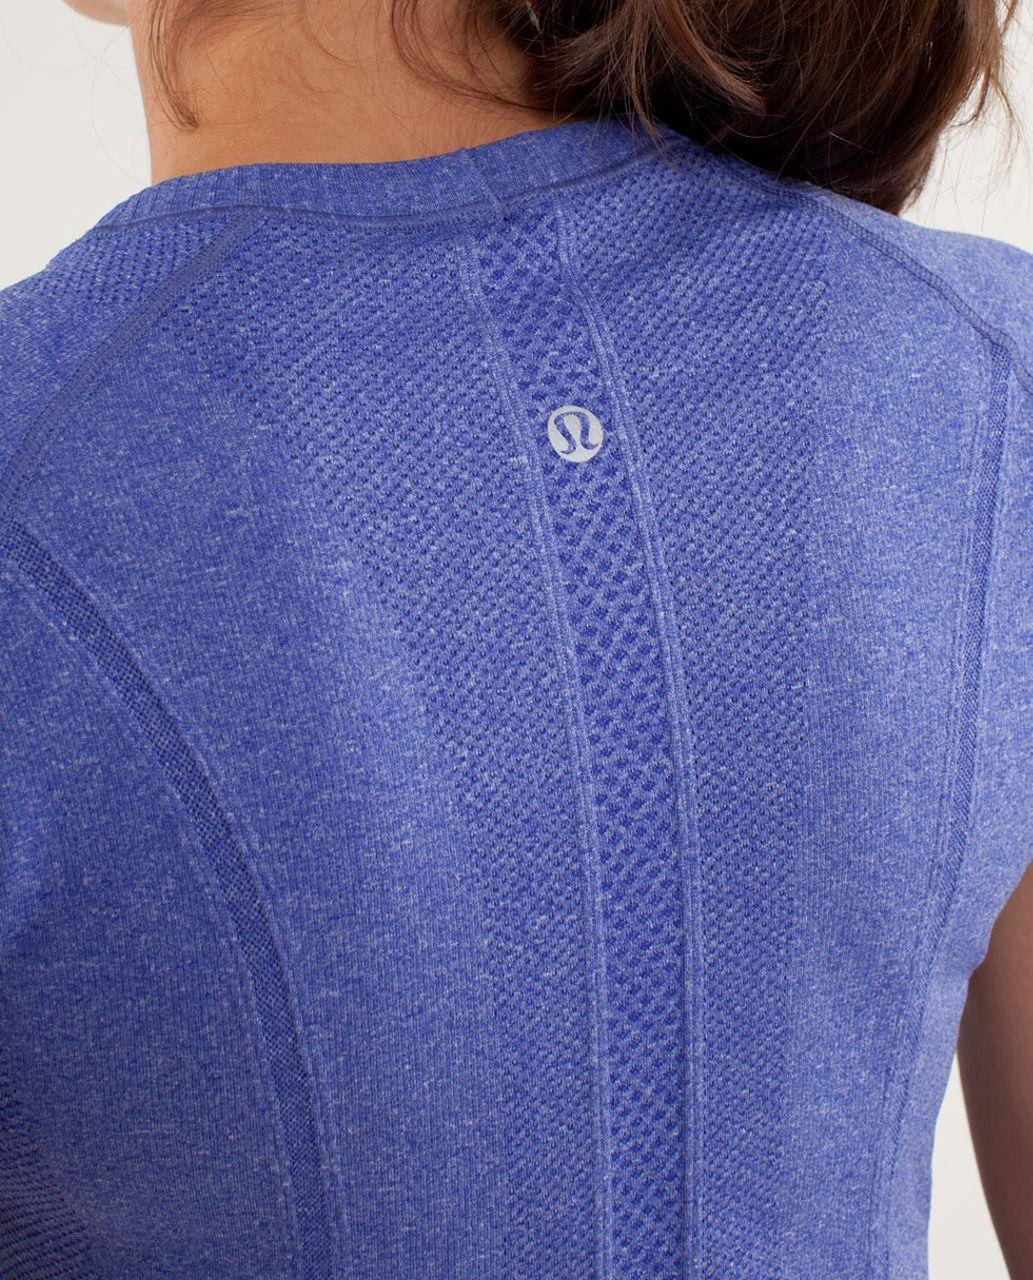 Lululemon Run:  Swiftly Tech Short Sleeve - Pigment Blue